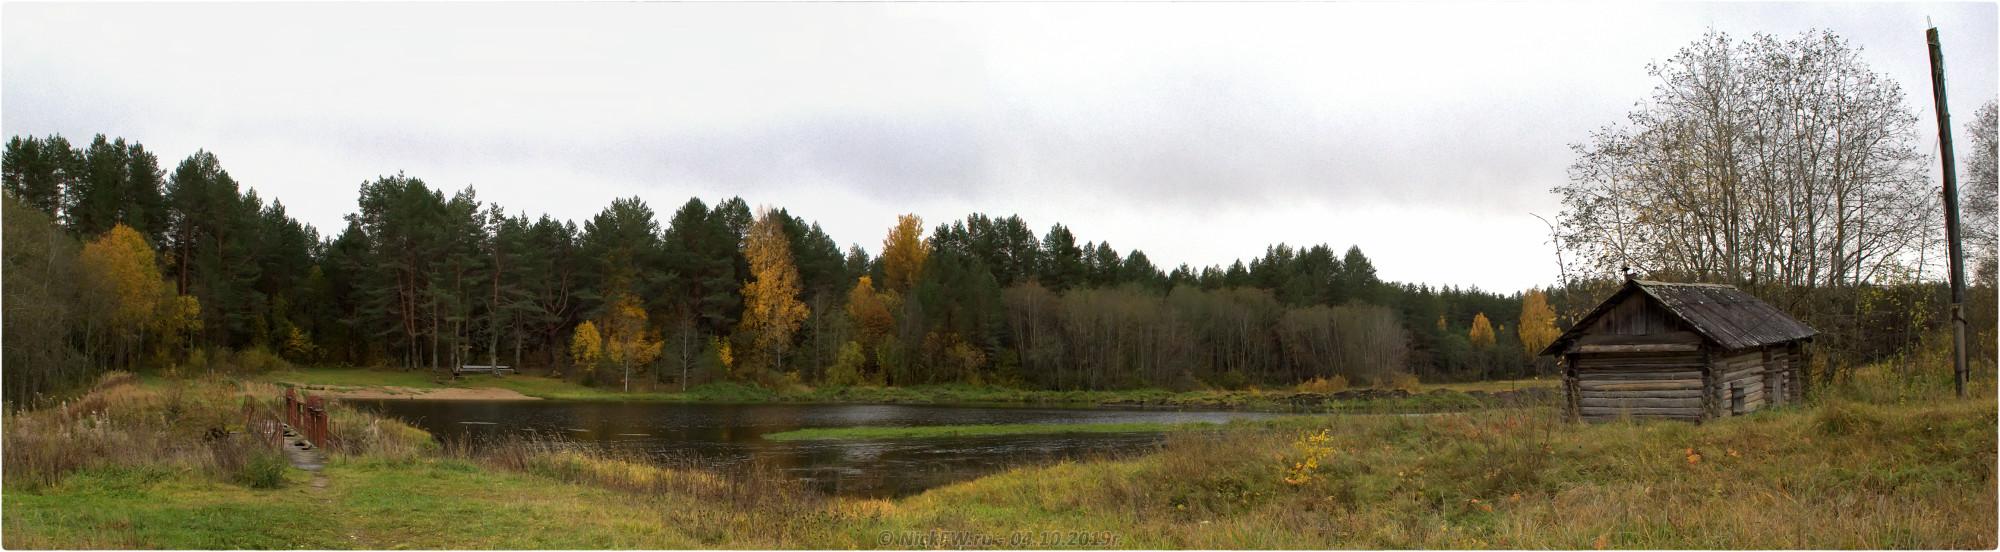 11. Панорама пруда на реке Белая в Климовщине © NickFW.ru - 04.10.2019г.